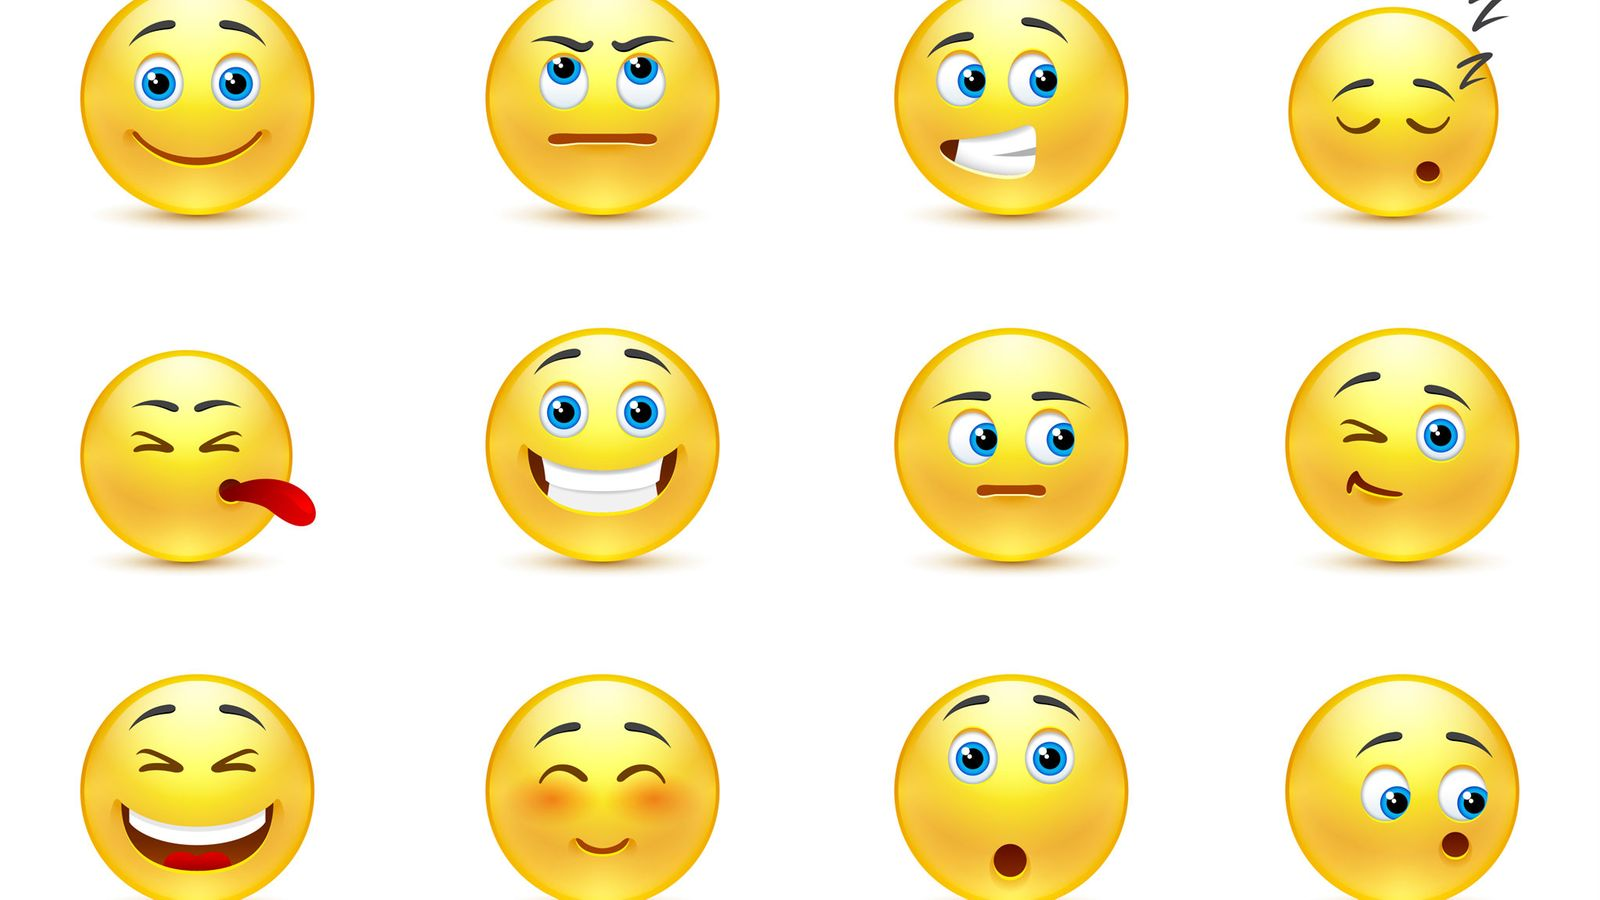 emoji hymiöiden merkitys Alajarvi